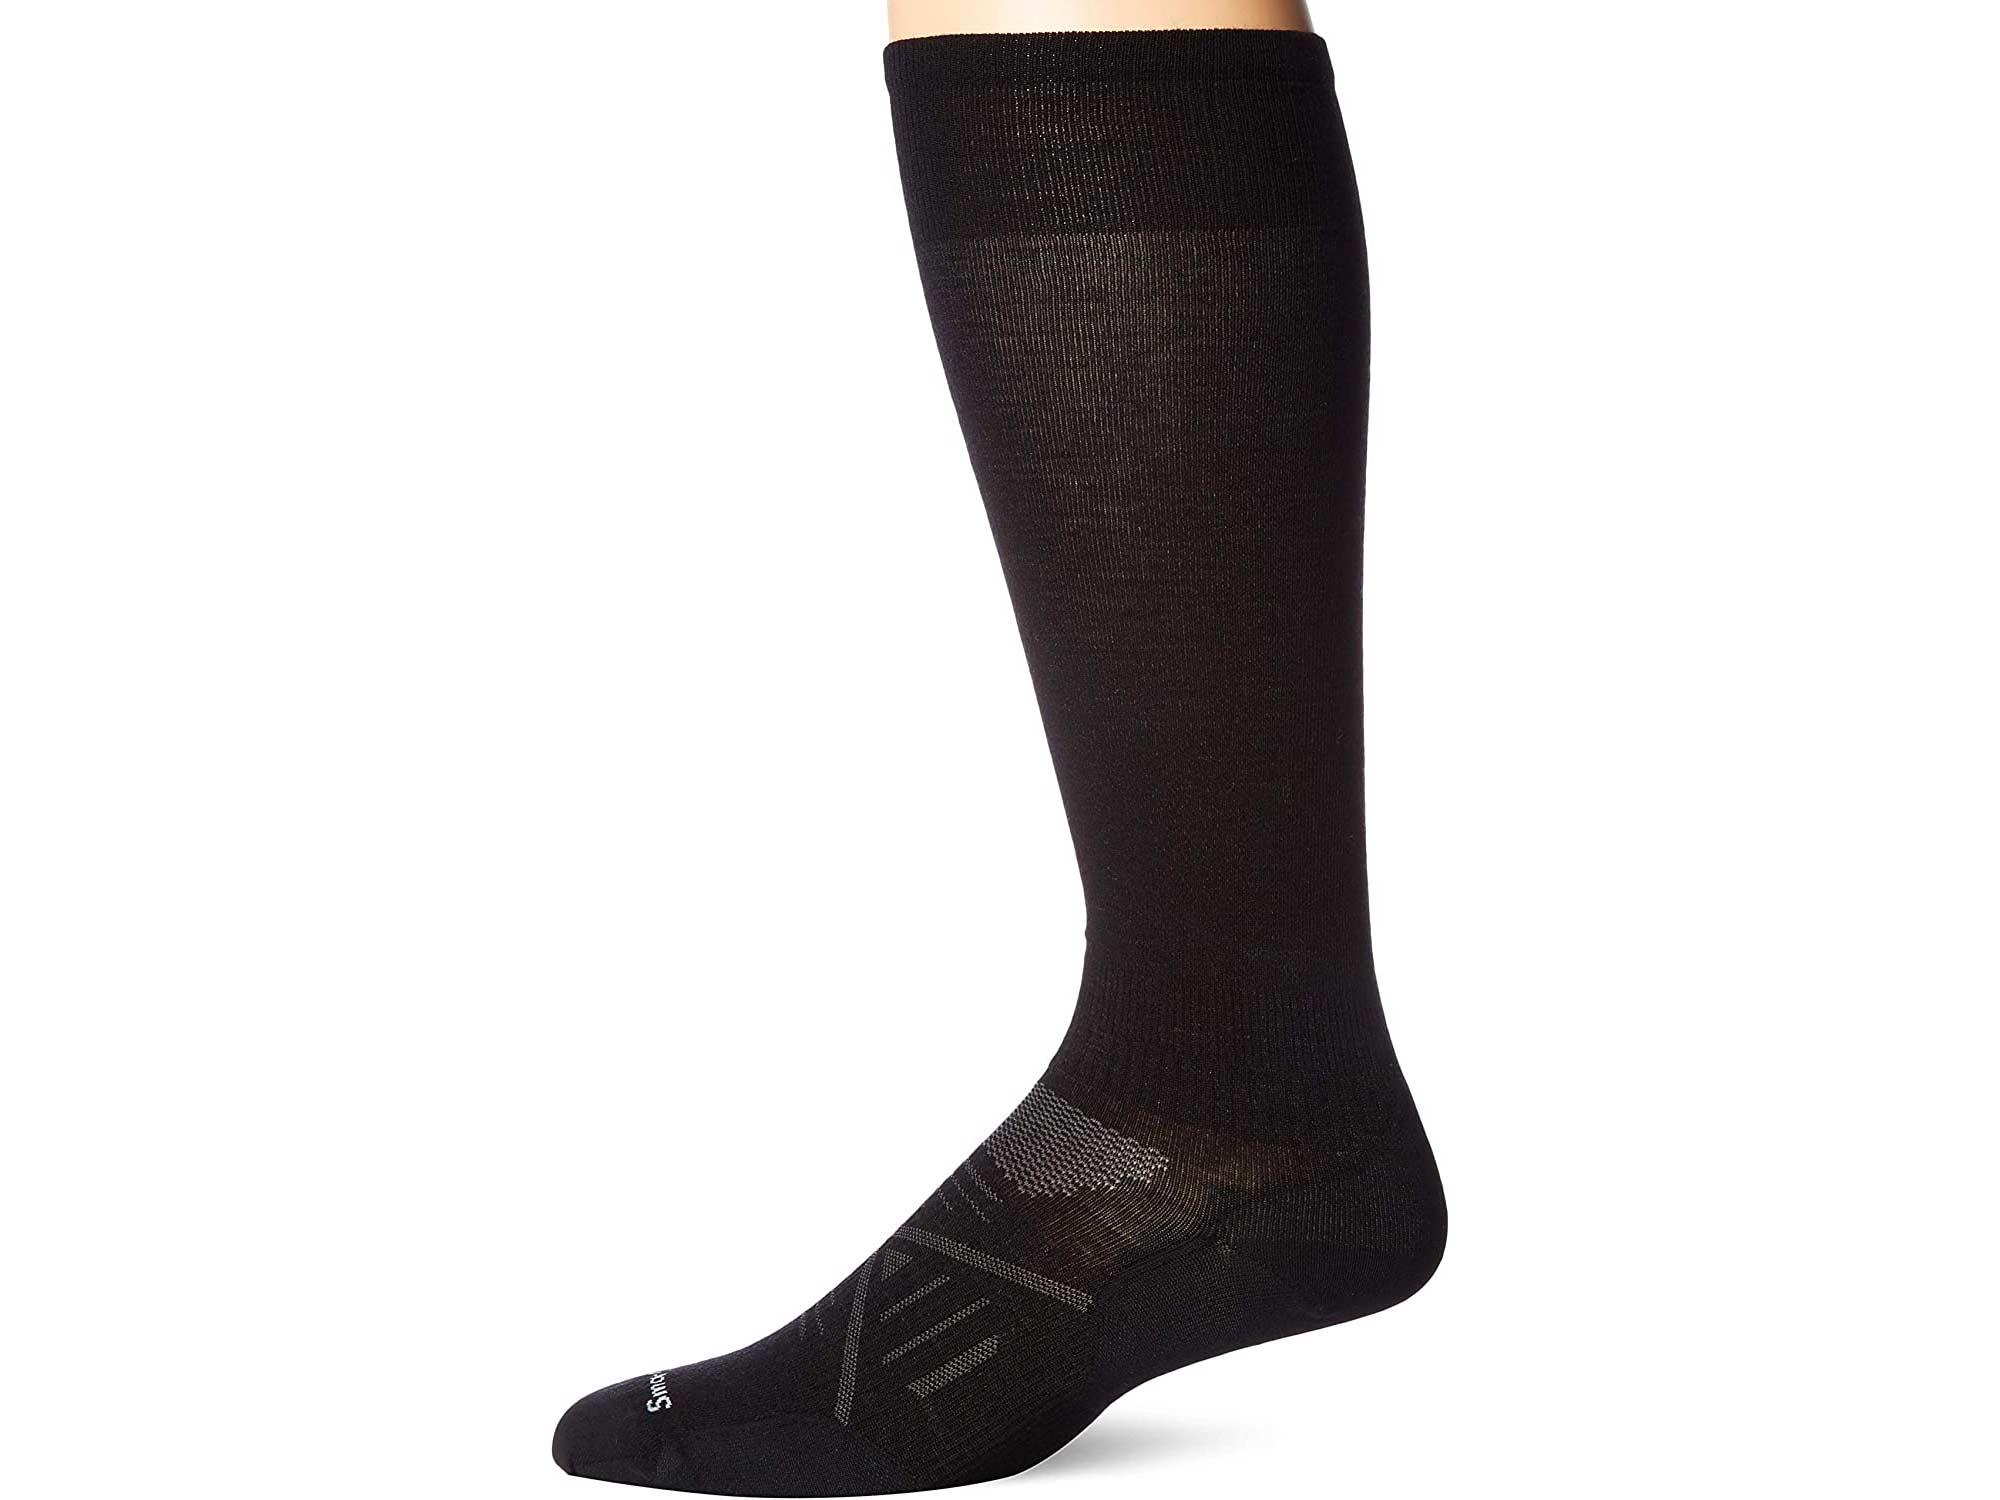 Smartwool ultra thin sock